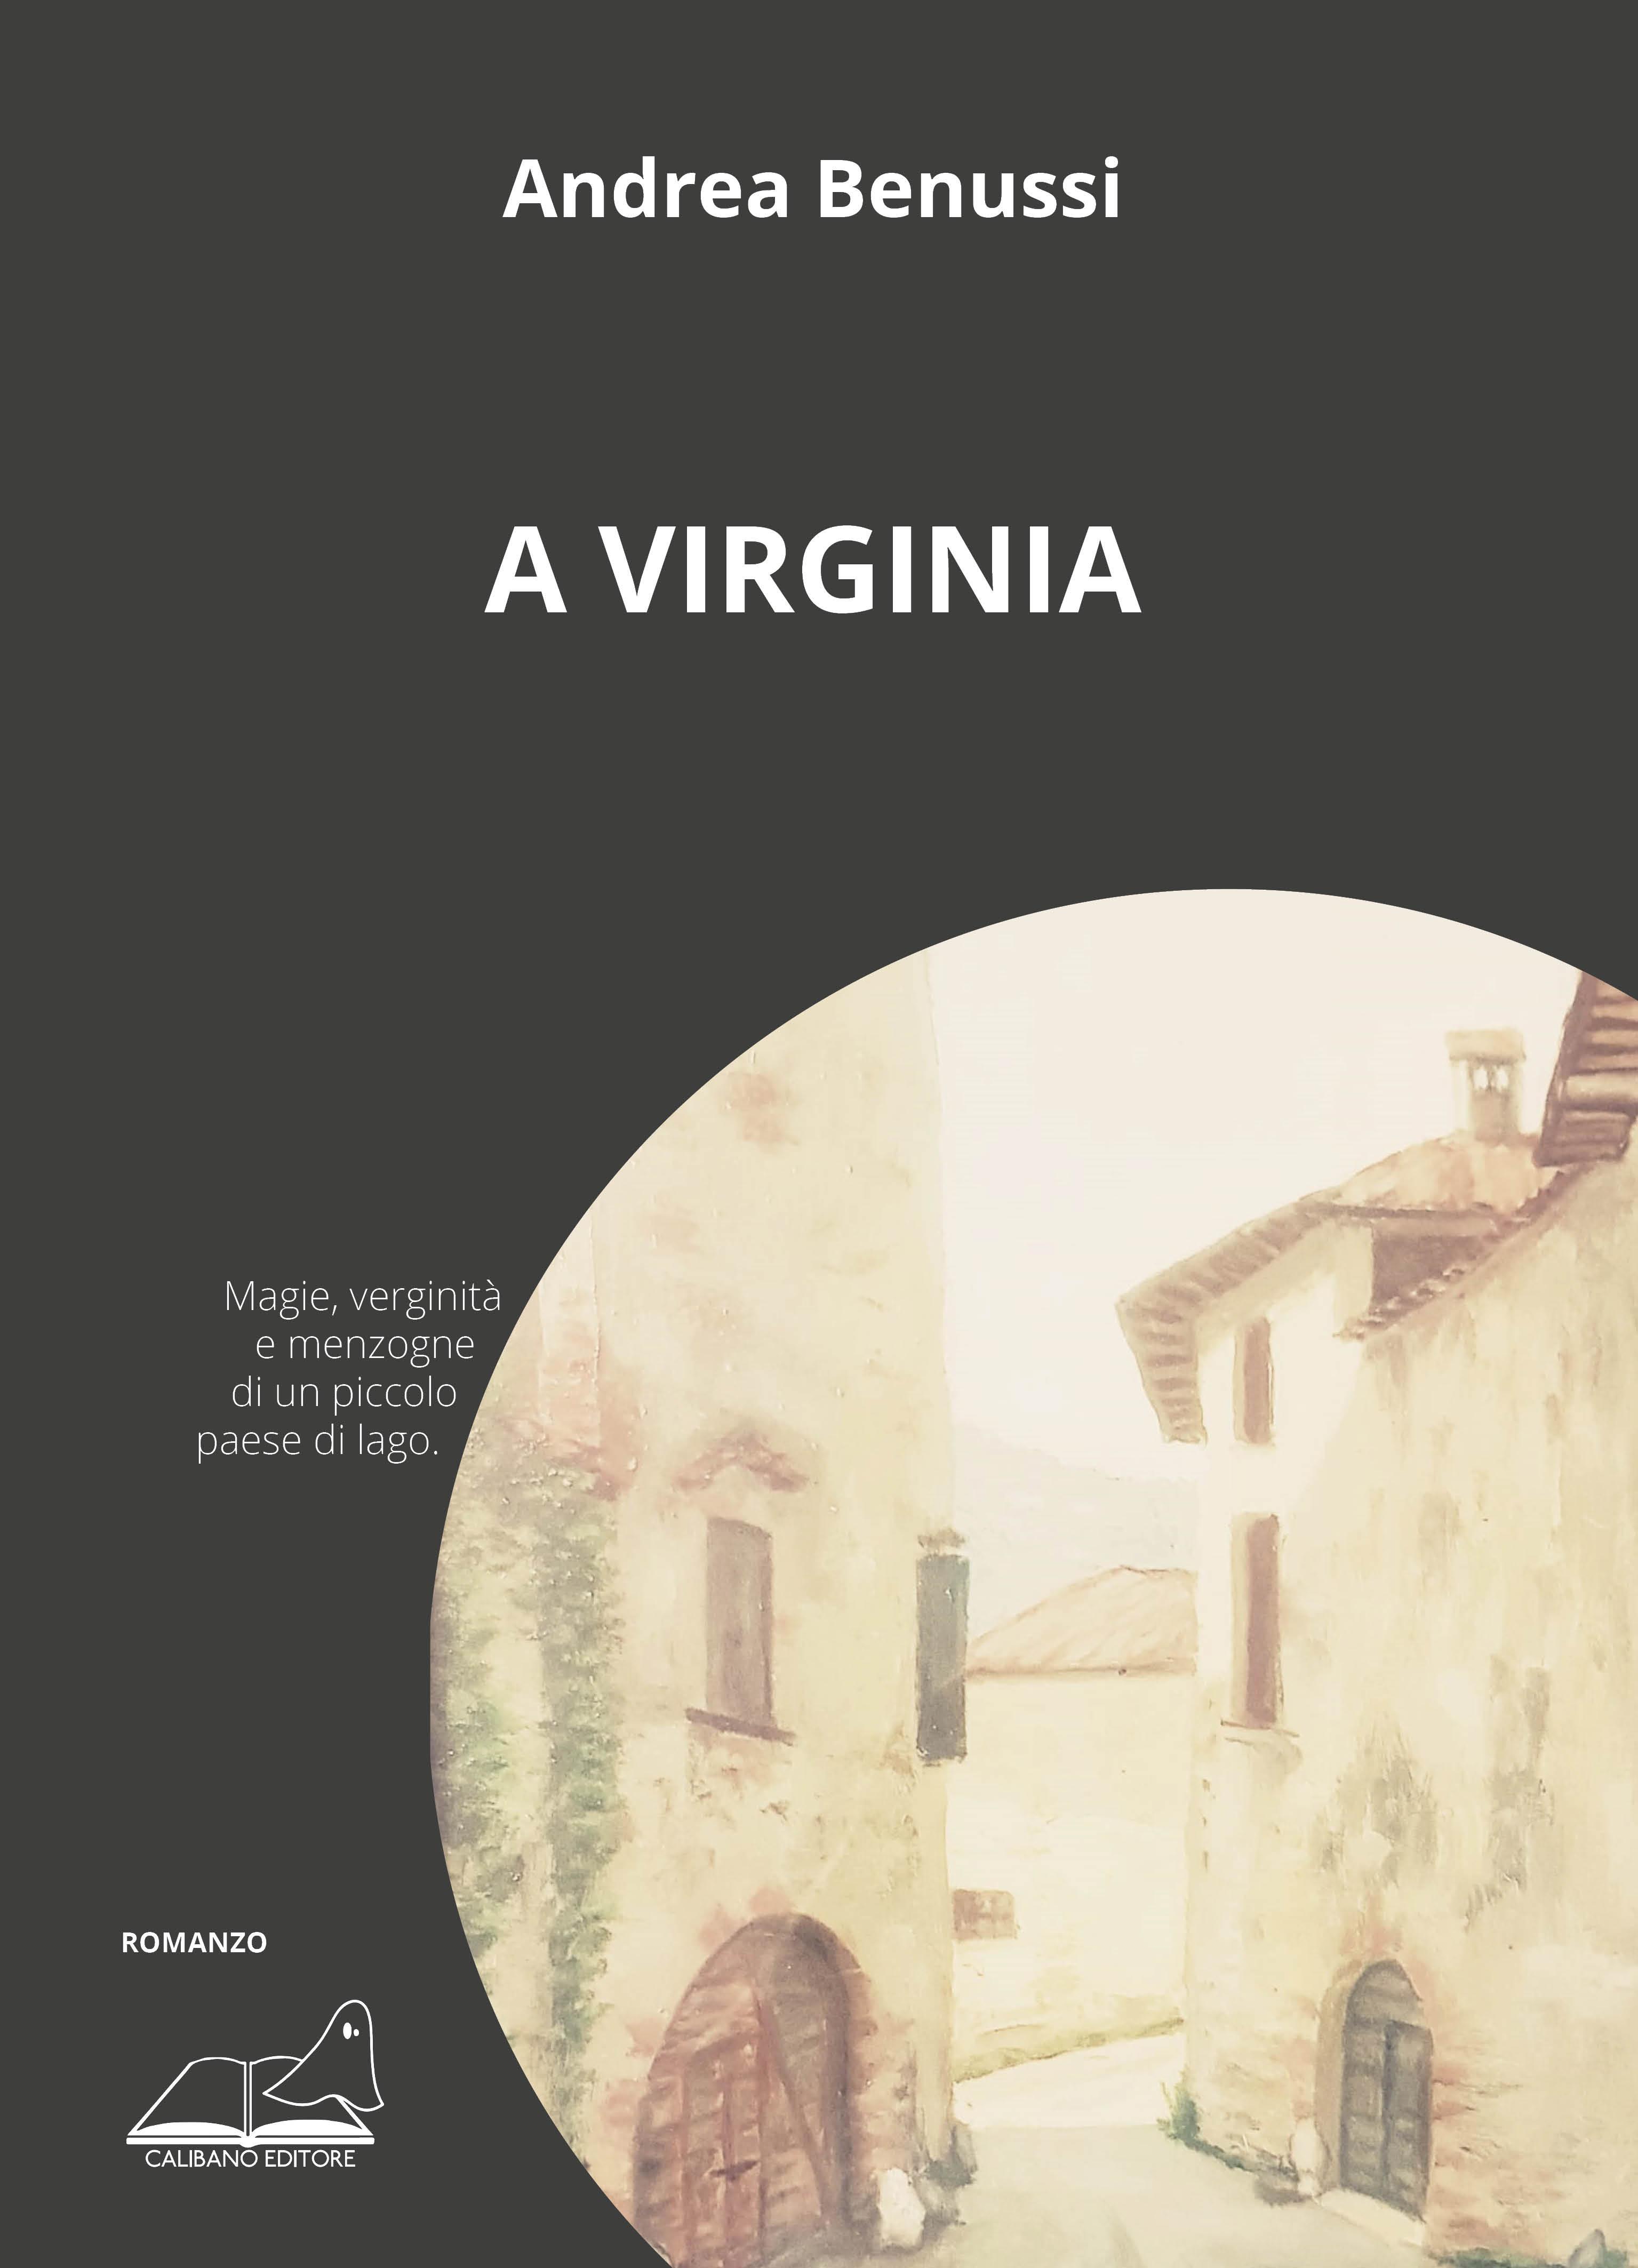 A Virginia-image-1%>